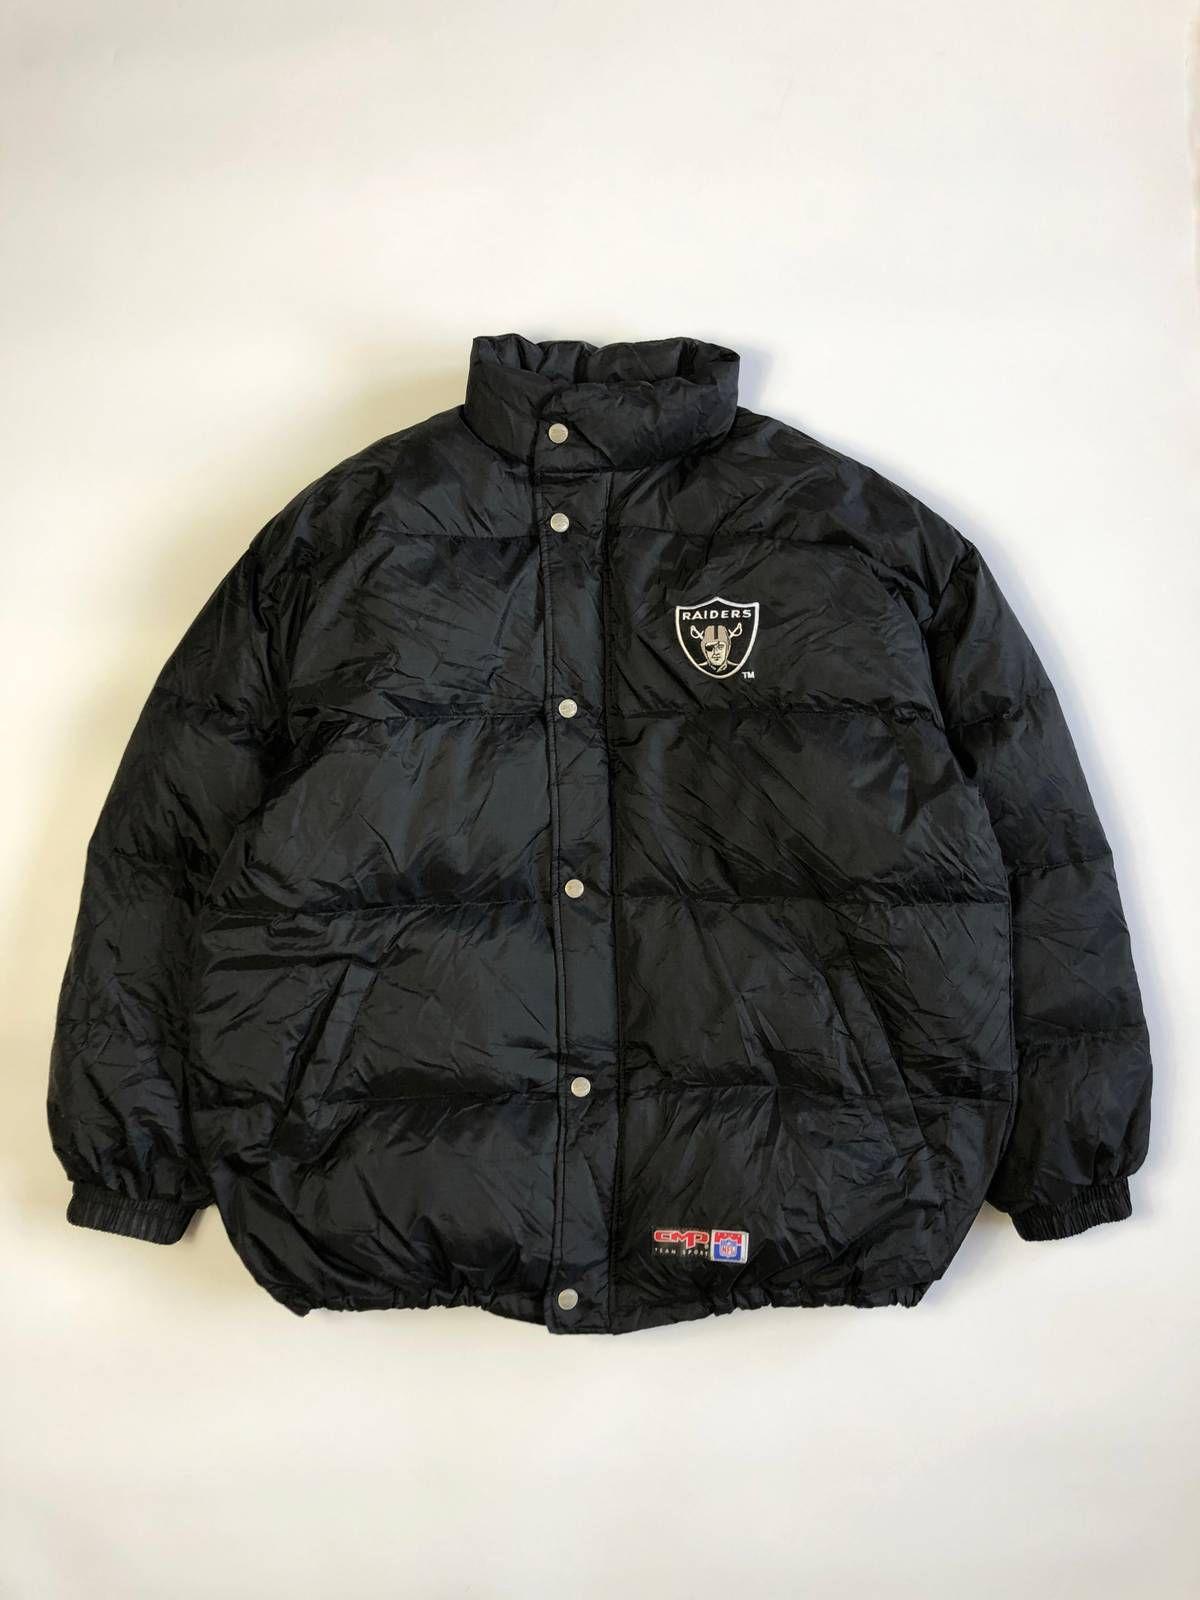 Oakland Raiders Nfl Cmp Team Sport Vintage Bubble Puffer Down Jacket Grailed Oakland Raiders Nfl Raiders Jackets [ 1600 x 1200 Pixel ]